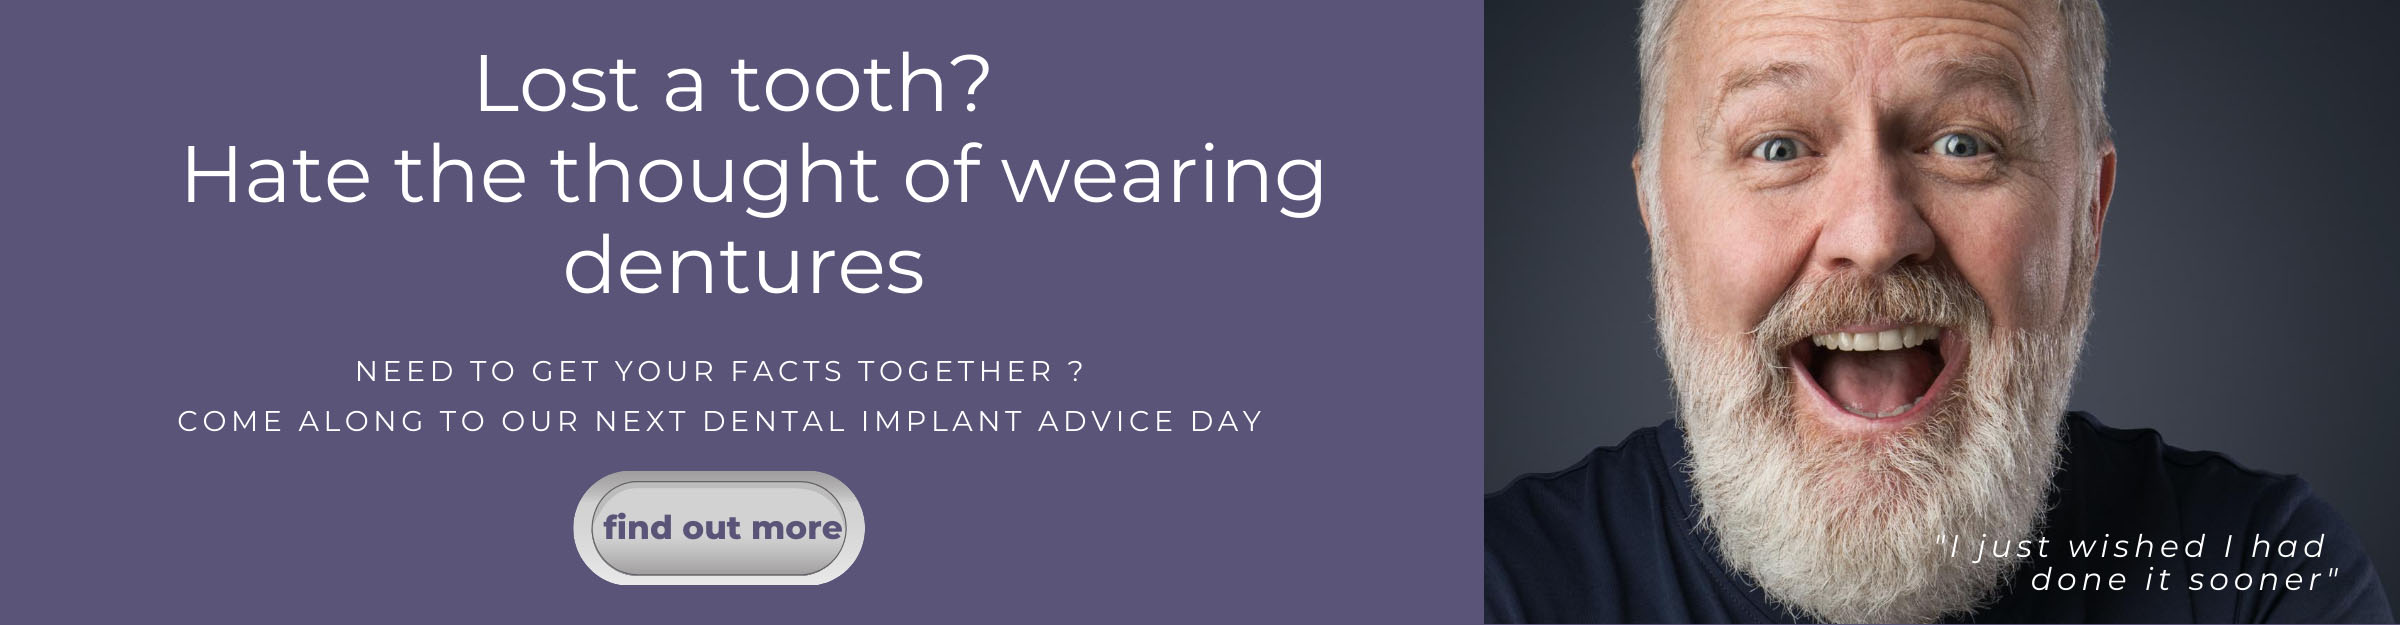 Dental Implant Advice Day